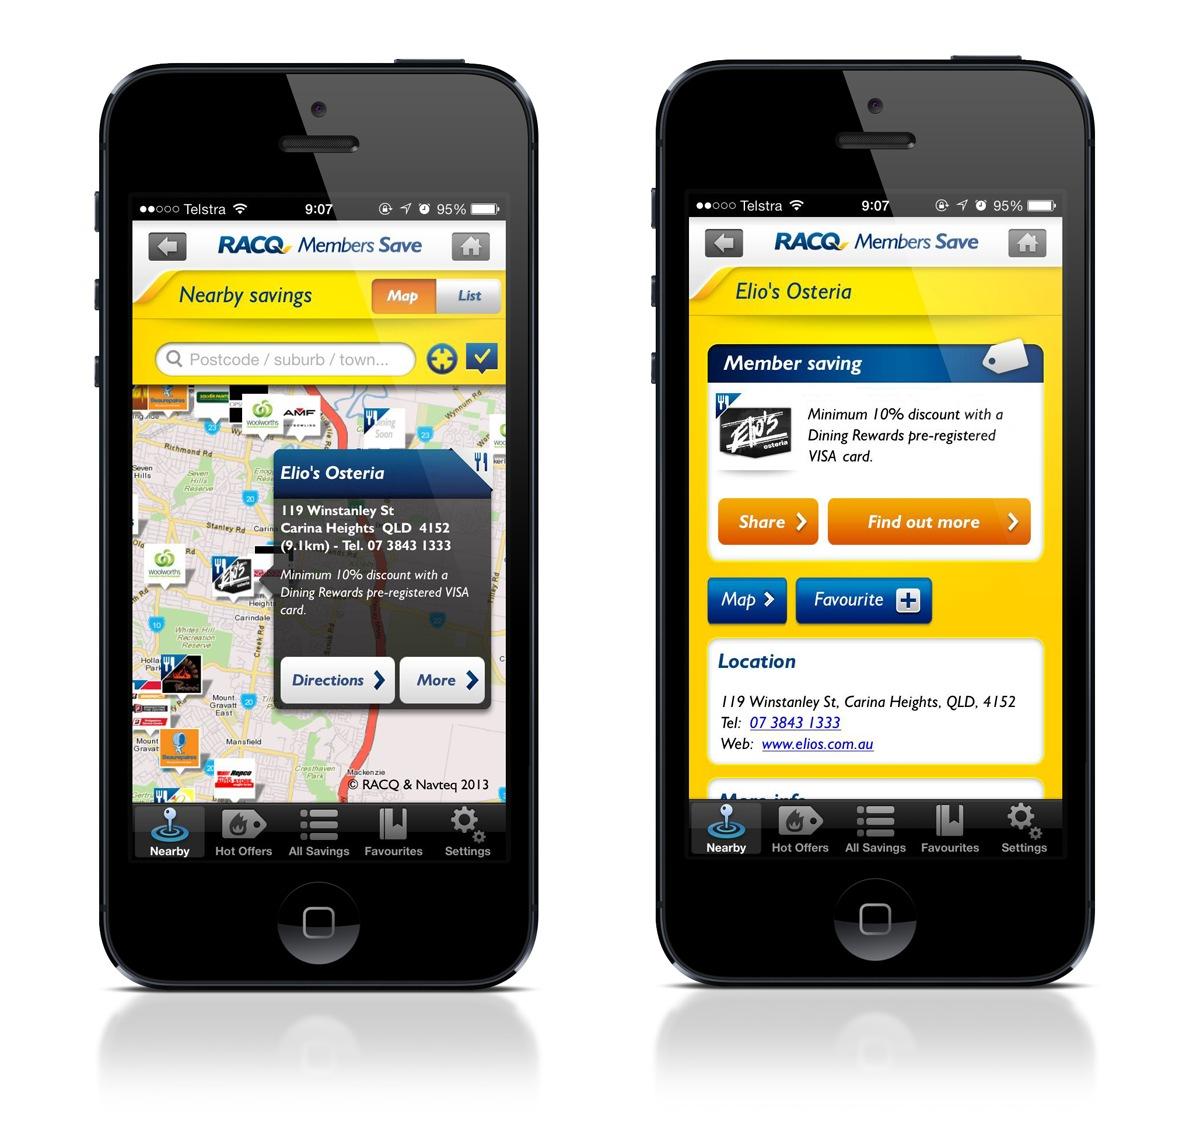 2012-02-Members-Save-iPhone-app-UI-v13-wp-(Aug-2013-Dining-Rewards-2).jpg